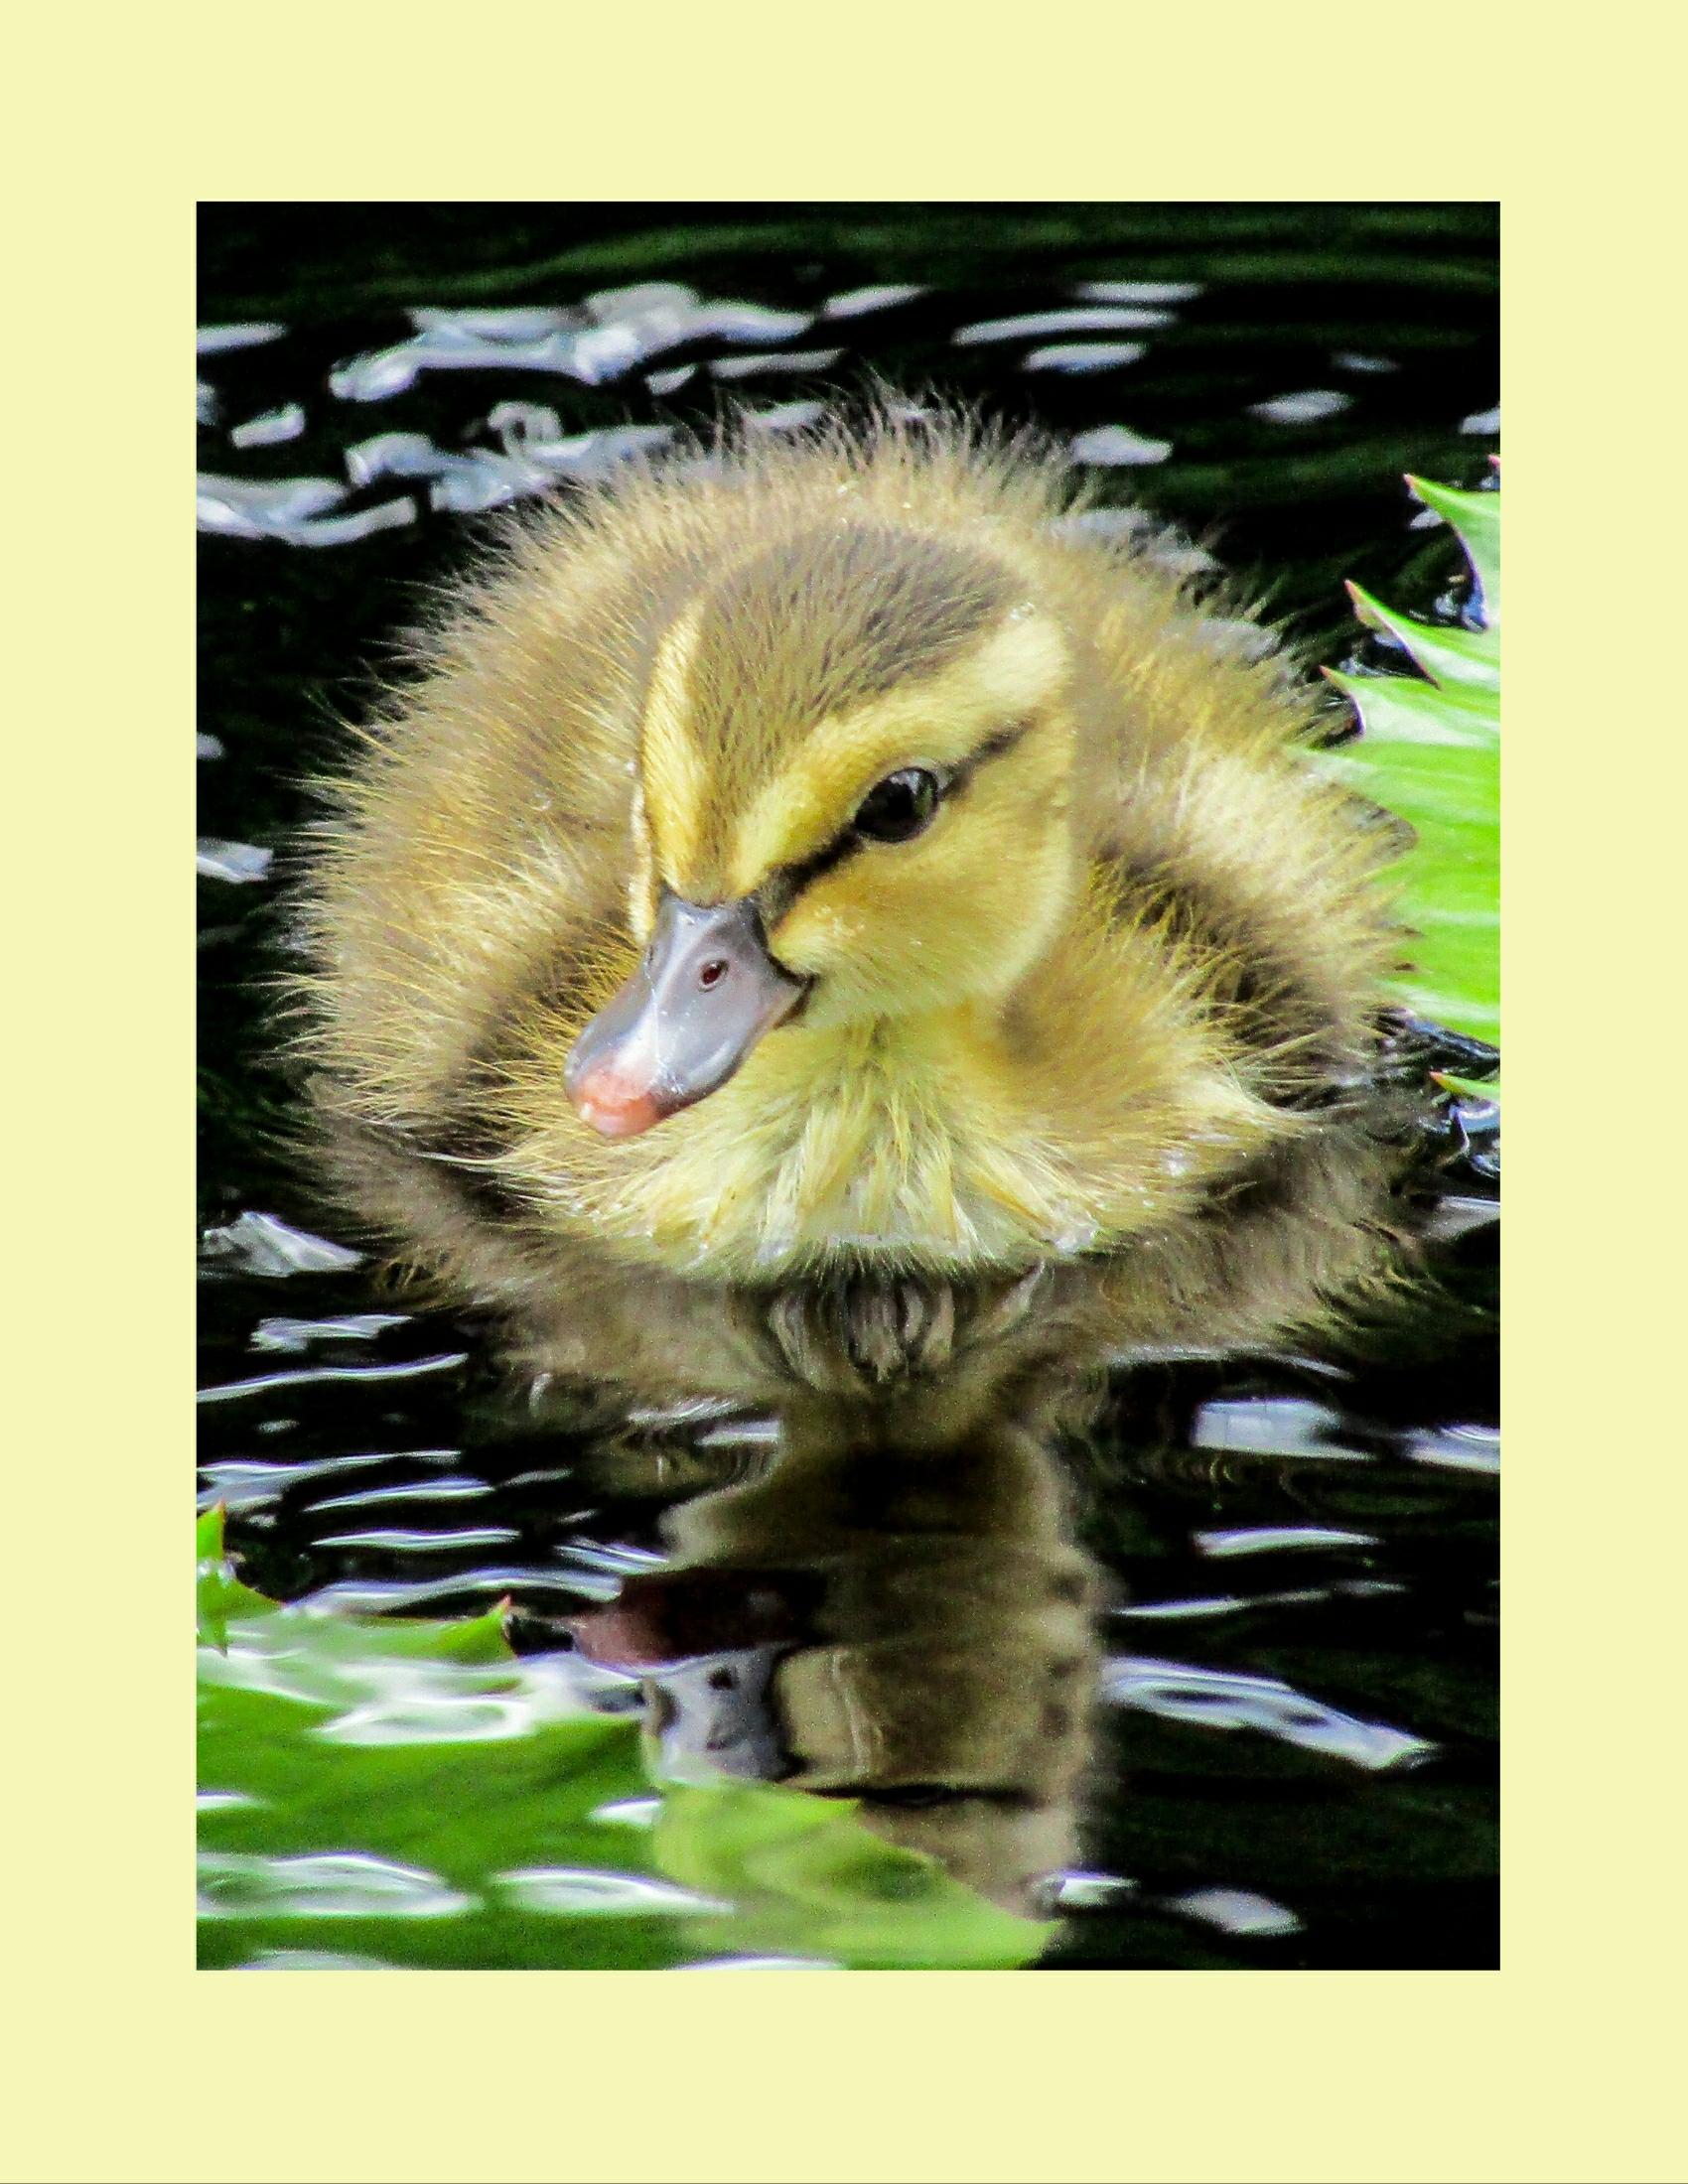 Darling Duckling, Valerie Hosna